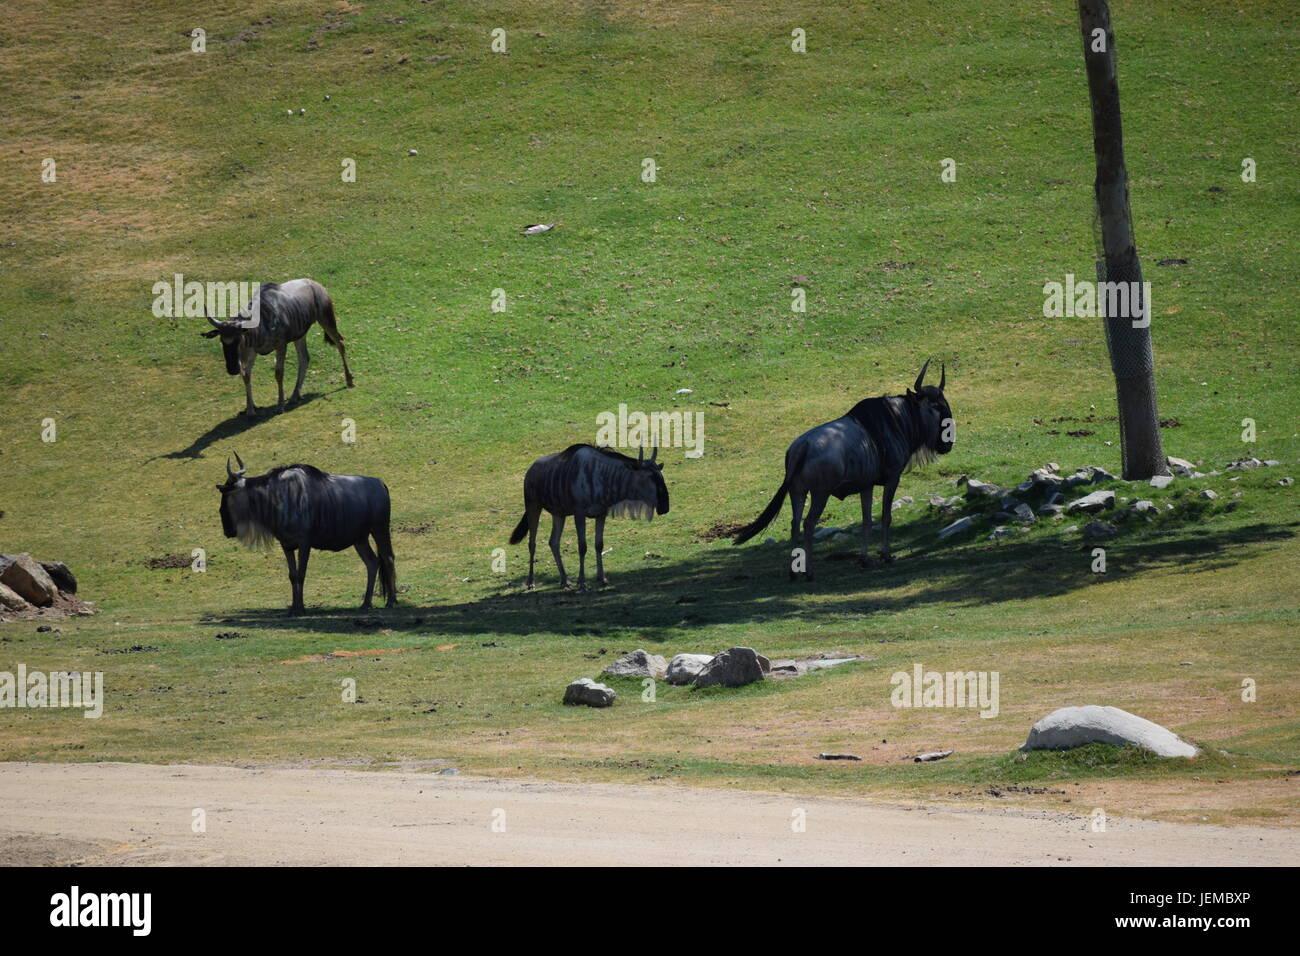 I gazed at the sight of many buffalo at the San Diego Safari Park. - Stock Image